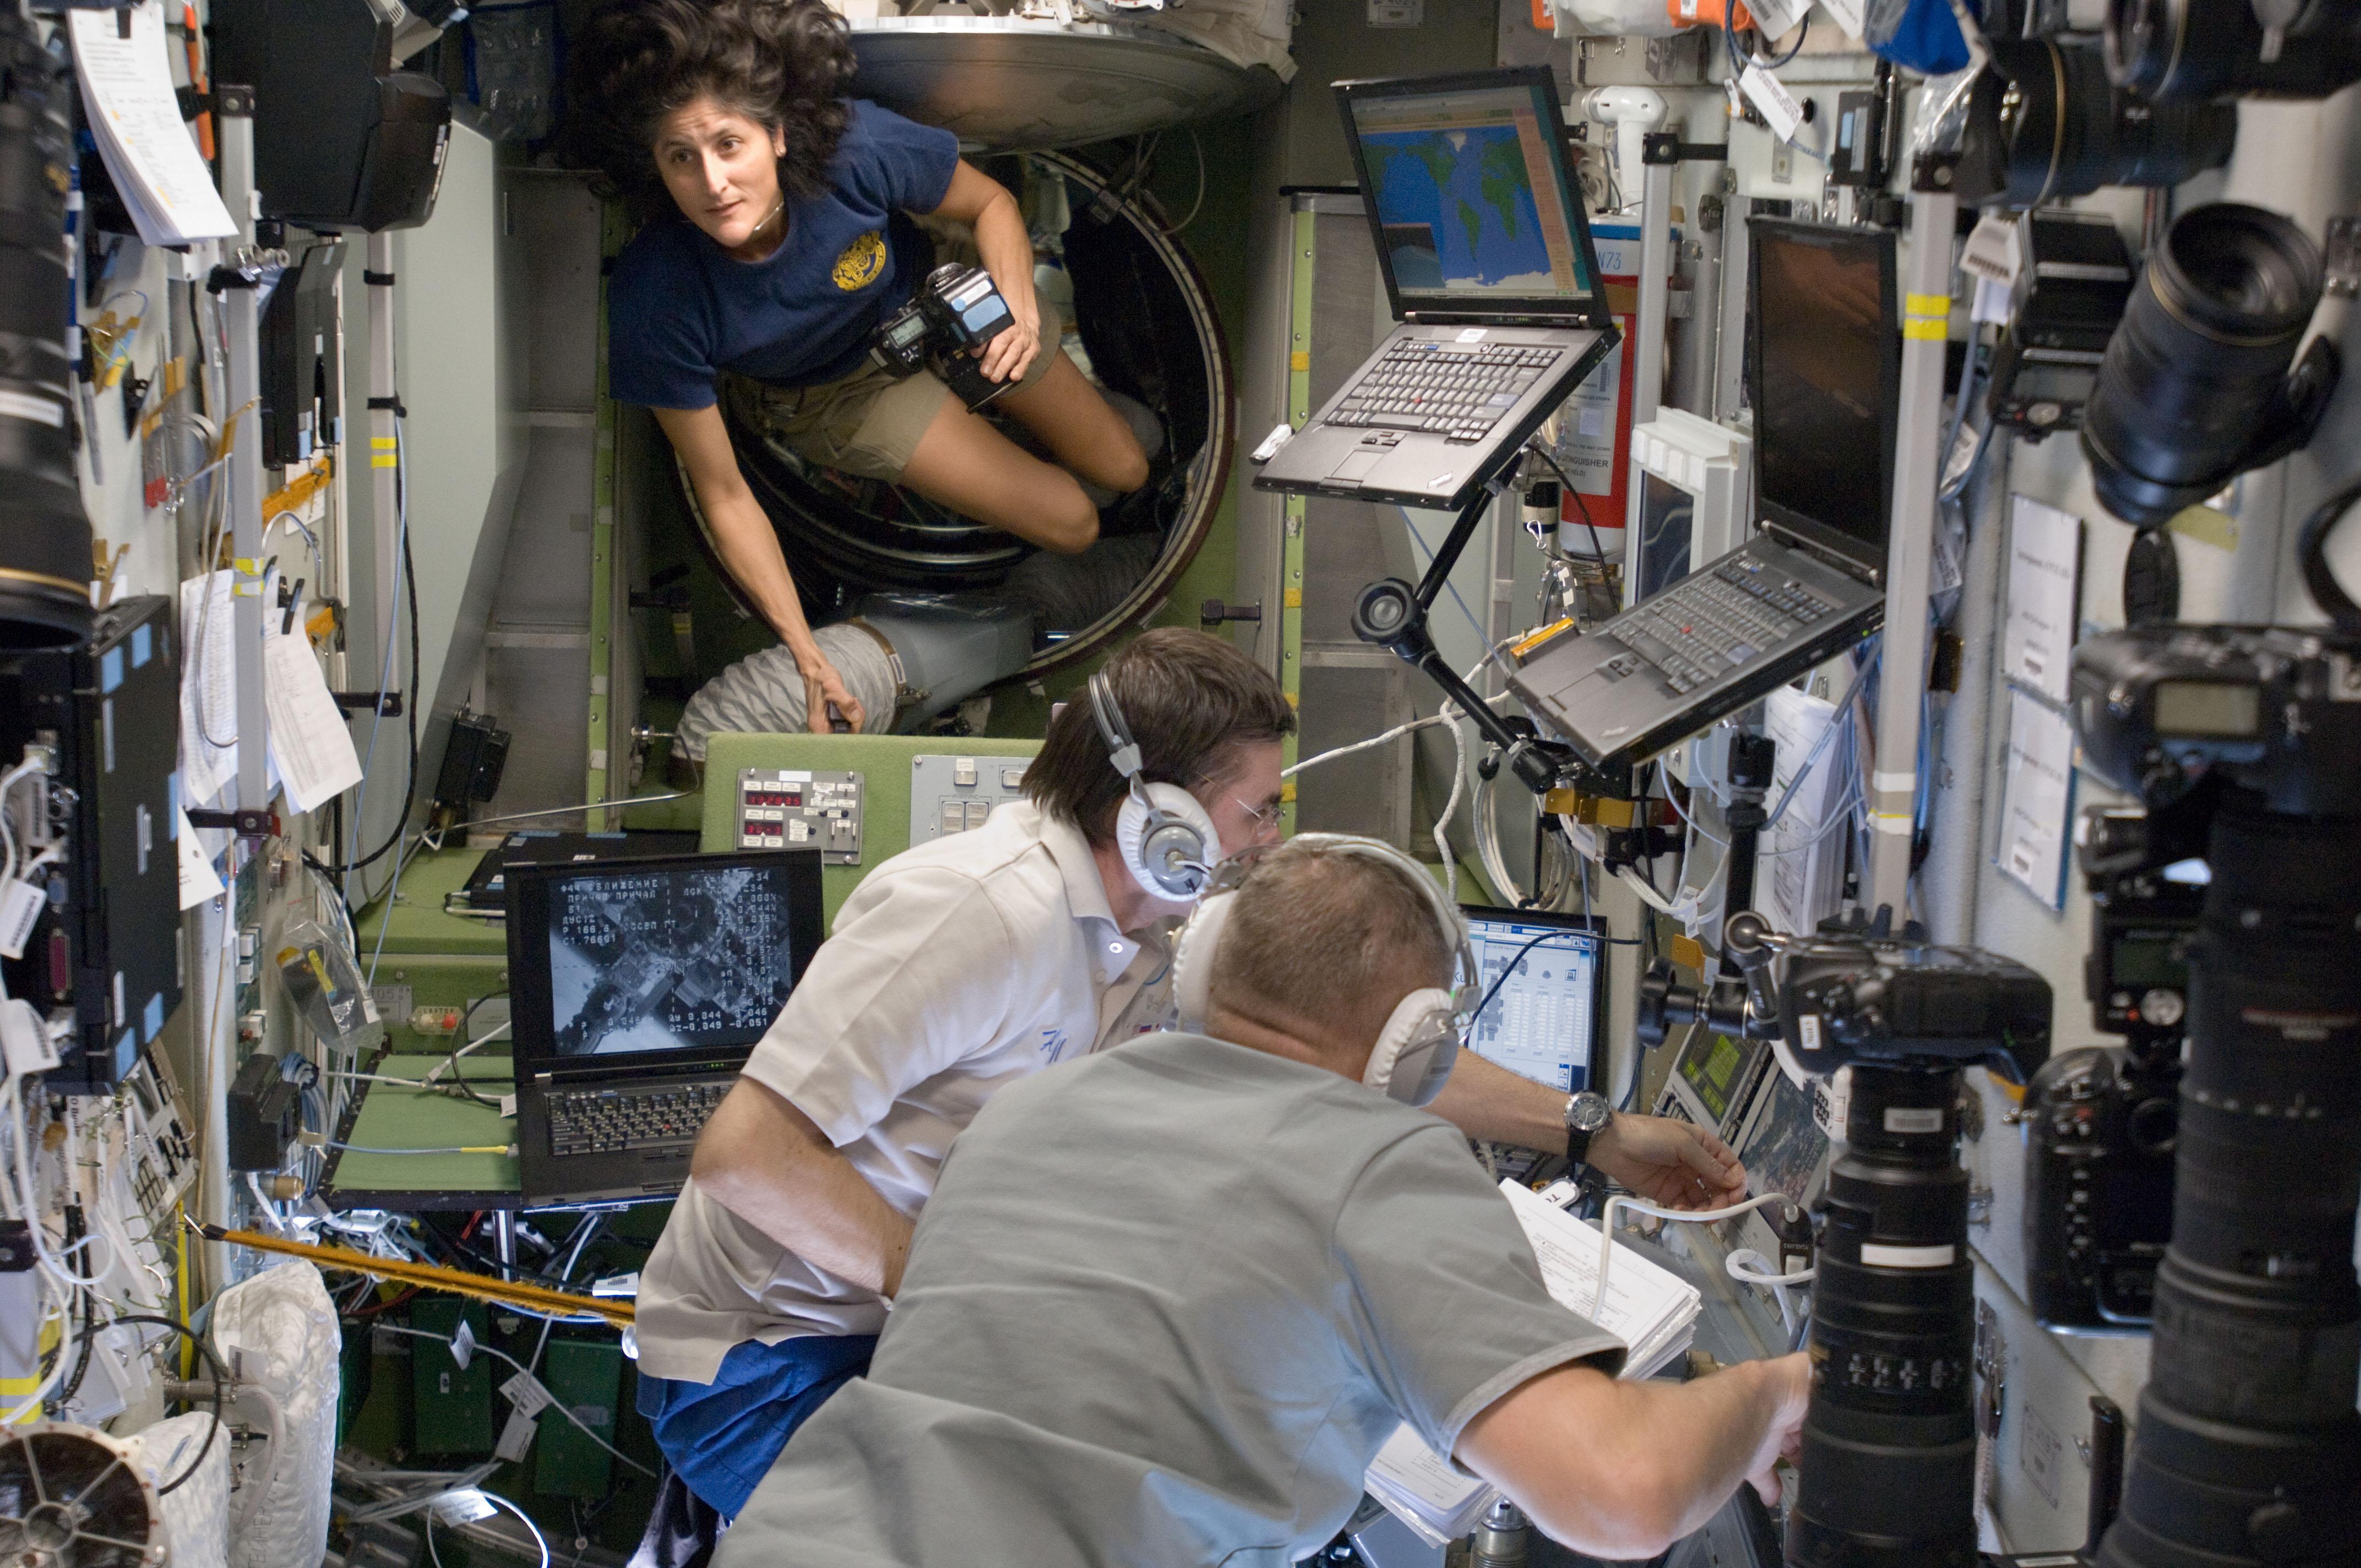 NASA - Sunita Williams, Yuri Malenchenko and Oleg Novitskiy